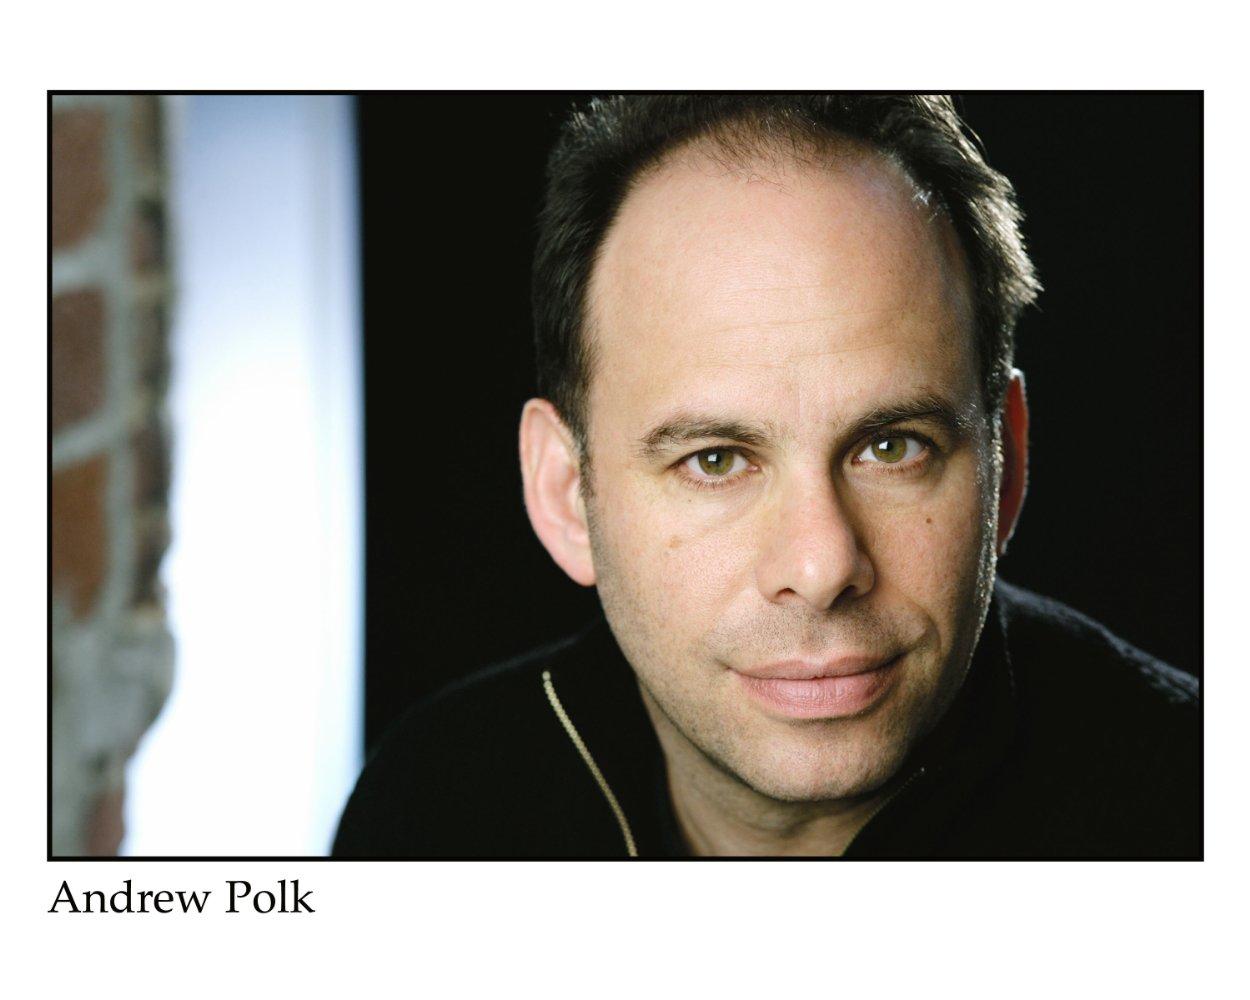 Andrew Polk